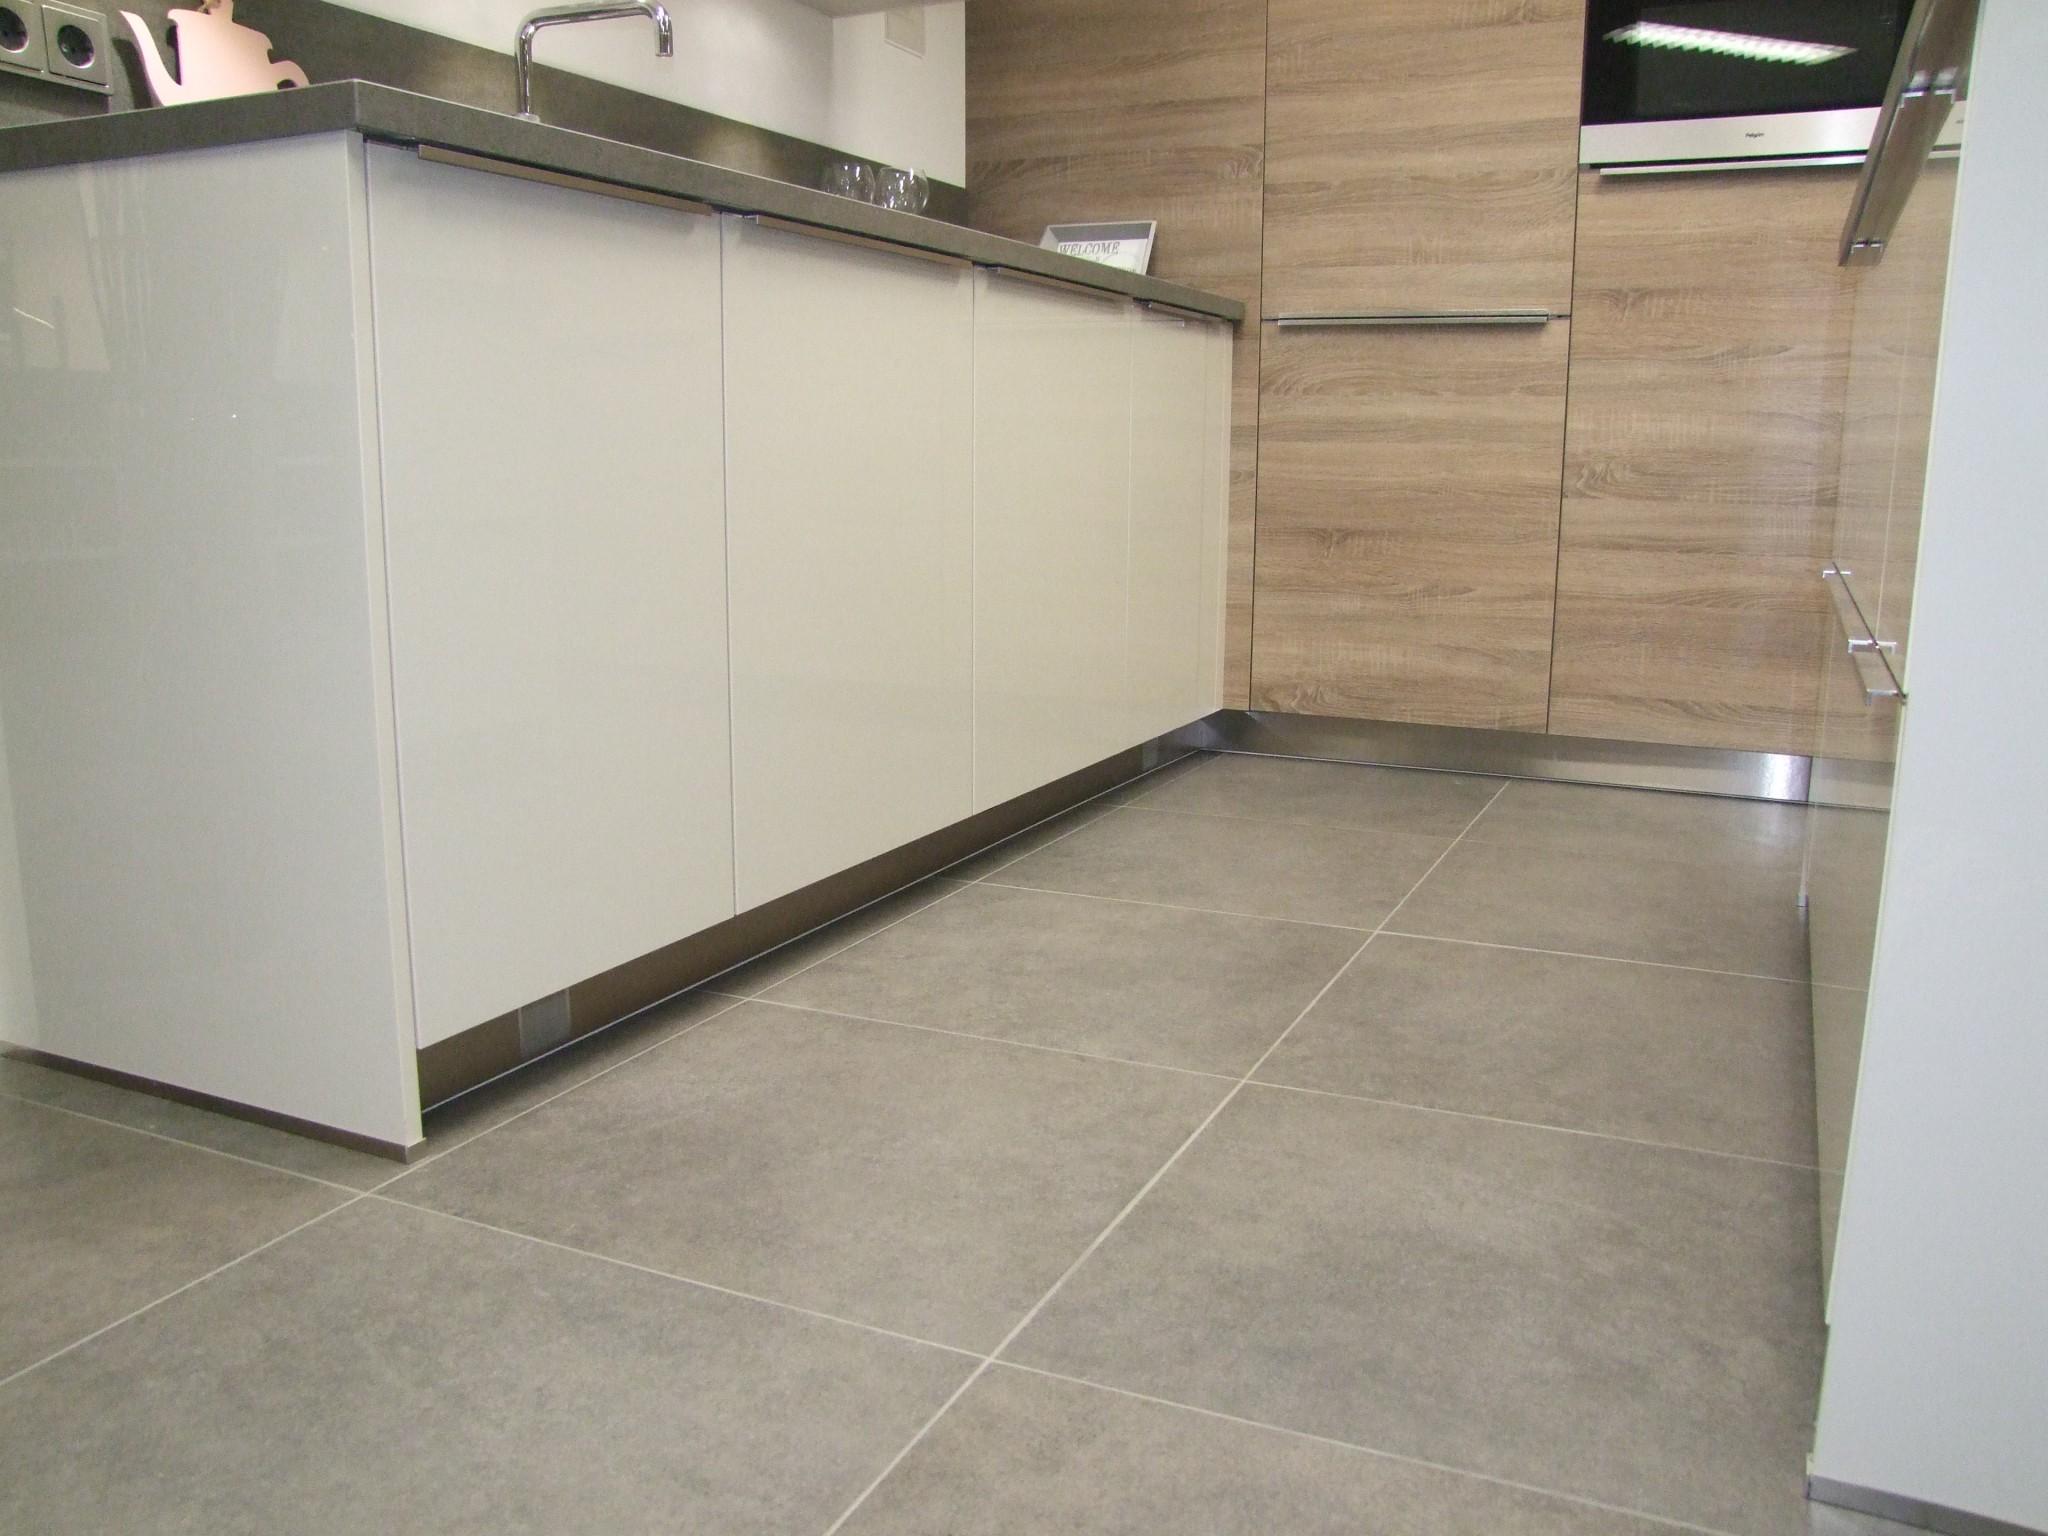 Rvs Plint Keuken : Rvs stopcontacten keuken nieuw rvs plint keuken best de mooiste